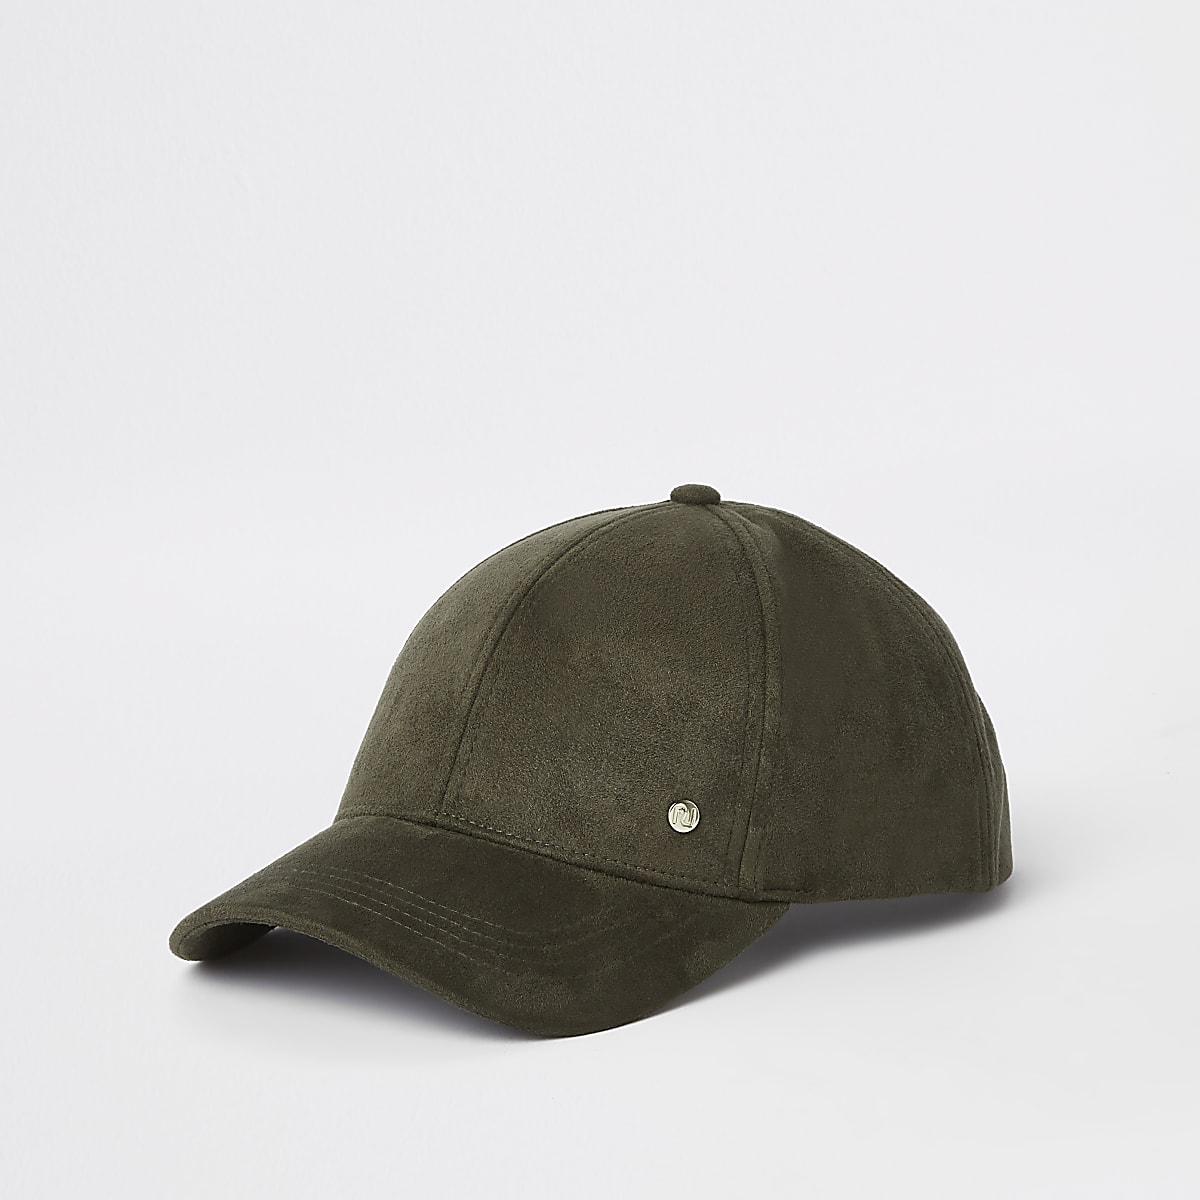 a1b3f1a53f99 Khaki faux suede baseball cap - Hats - Accessories - women